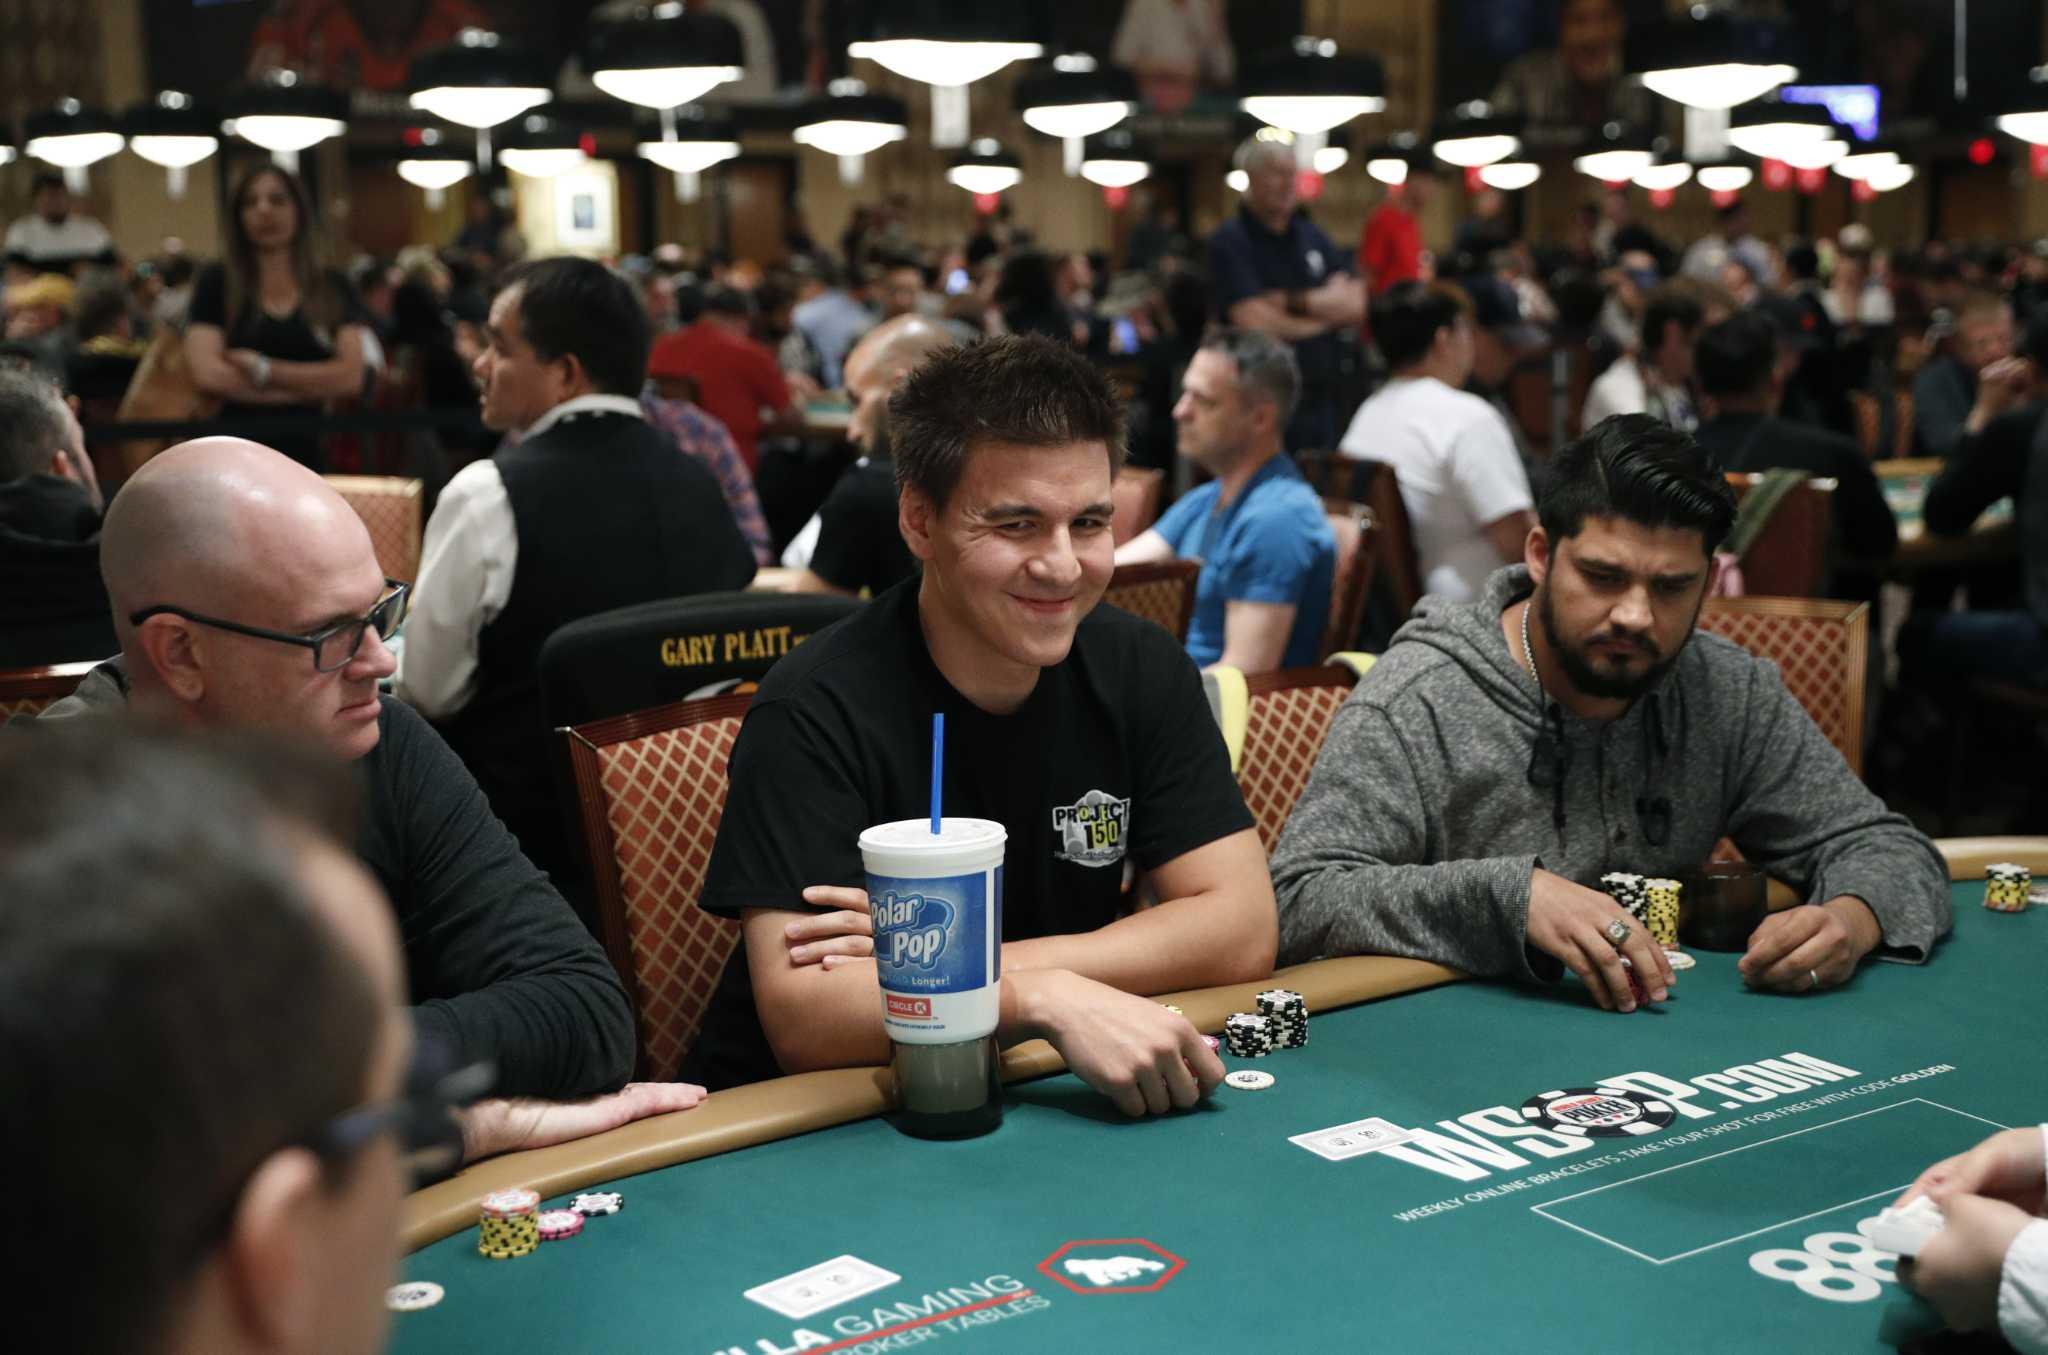 Hollywood park casino tournament results ny casino listings